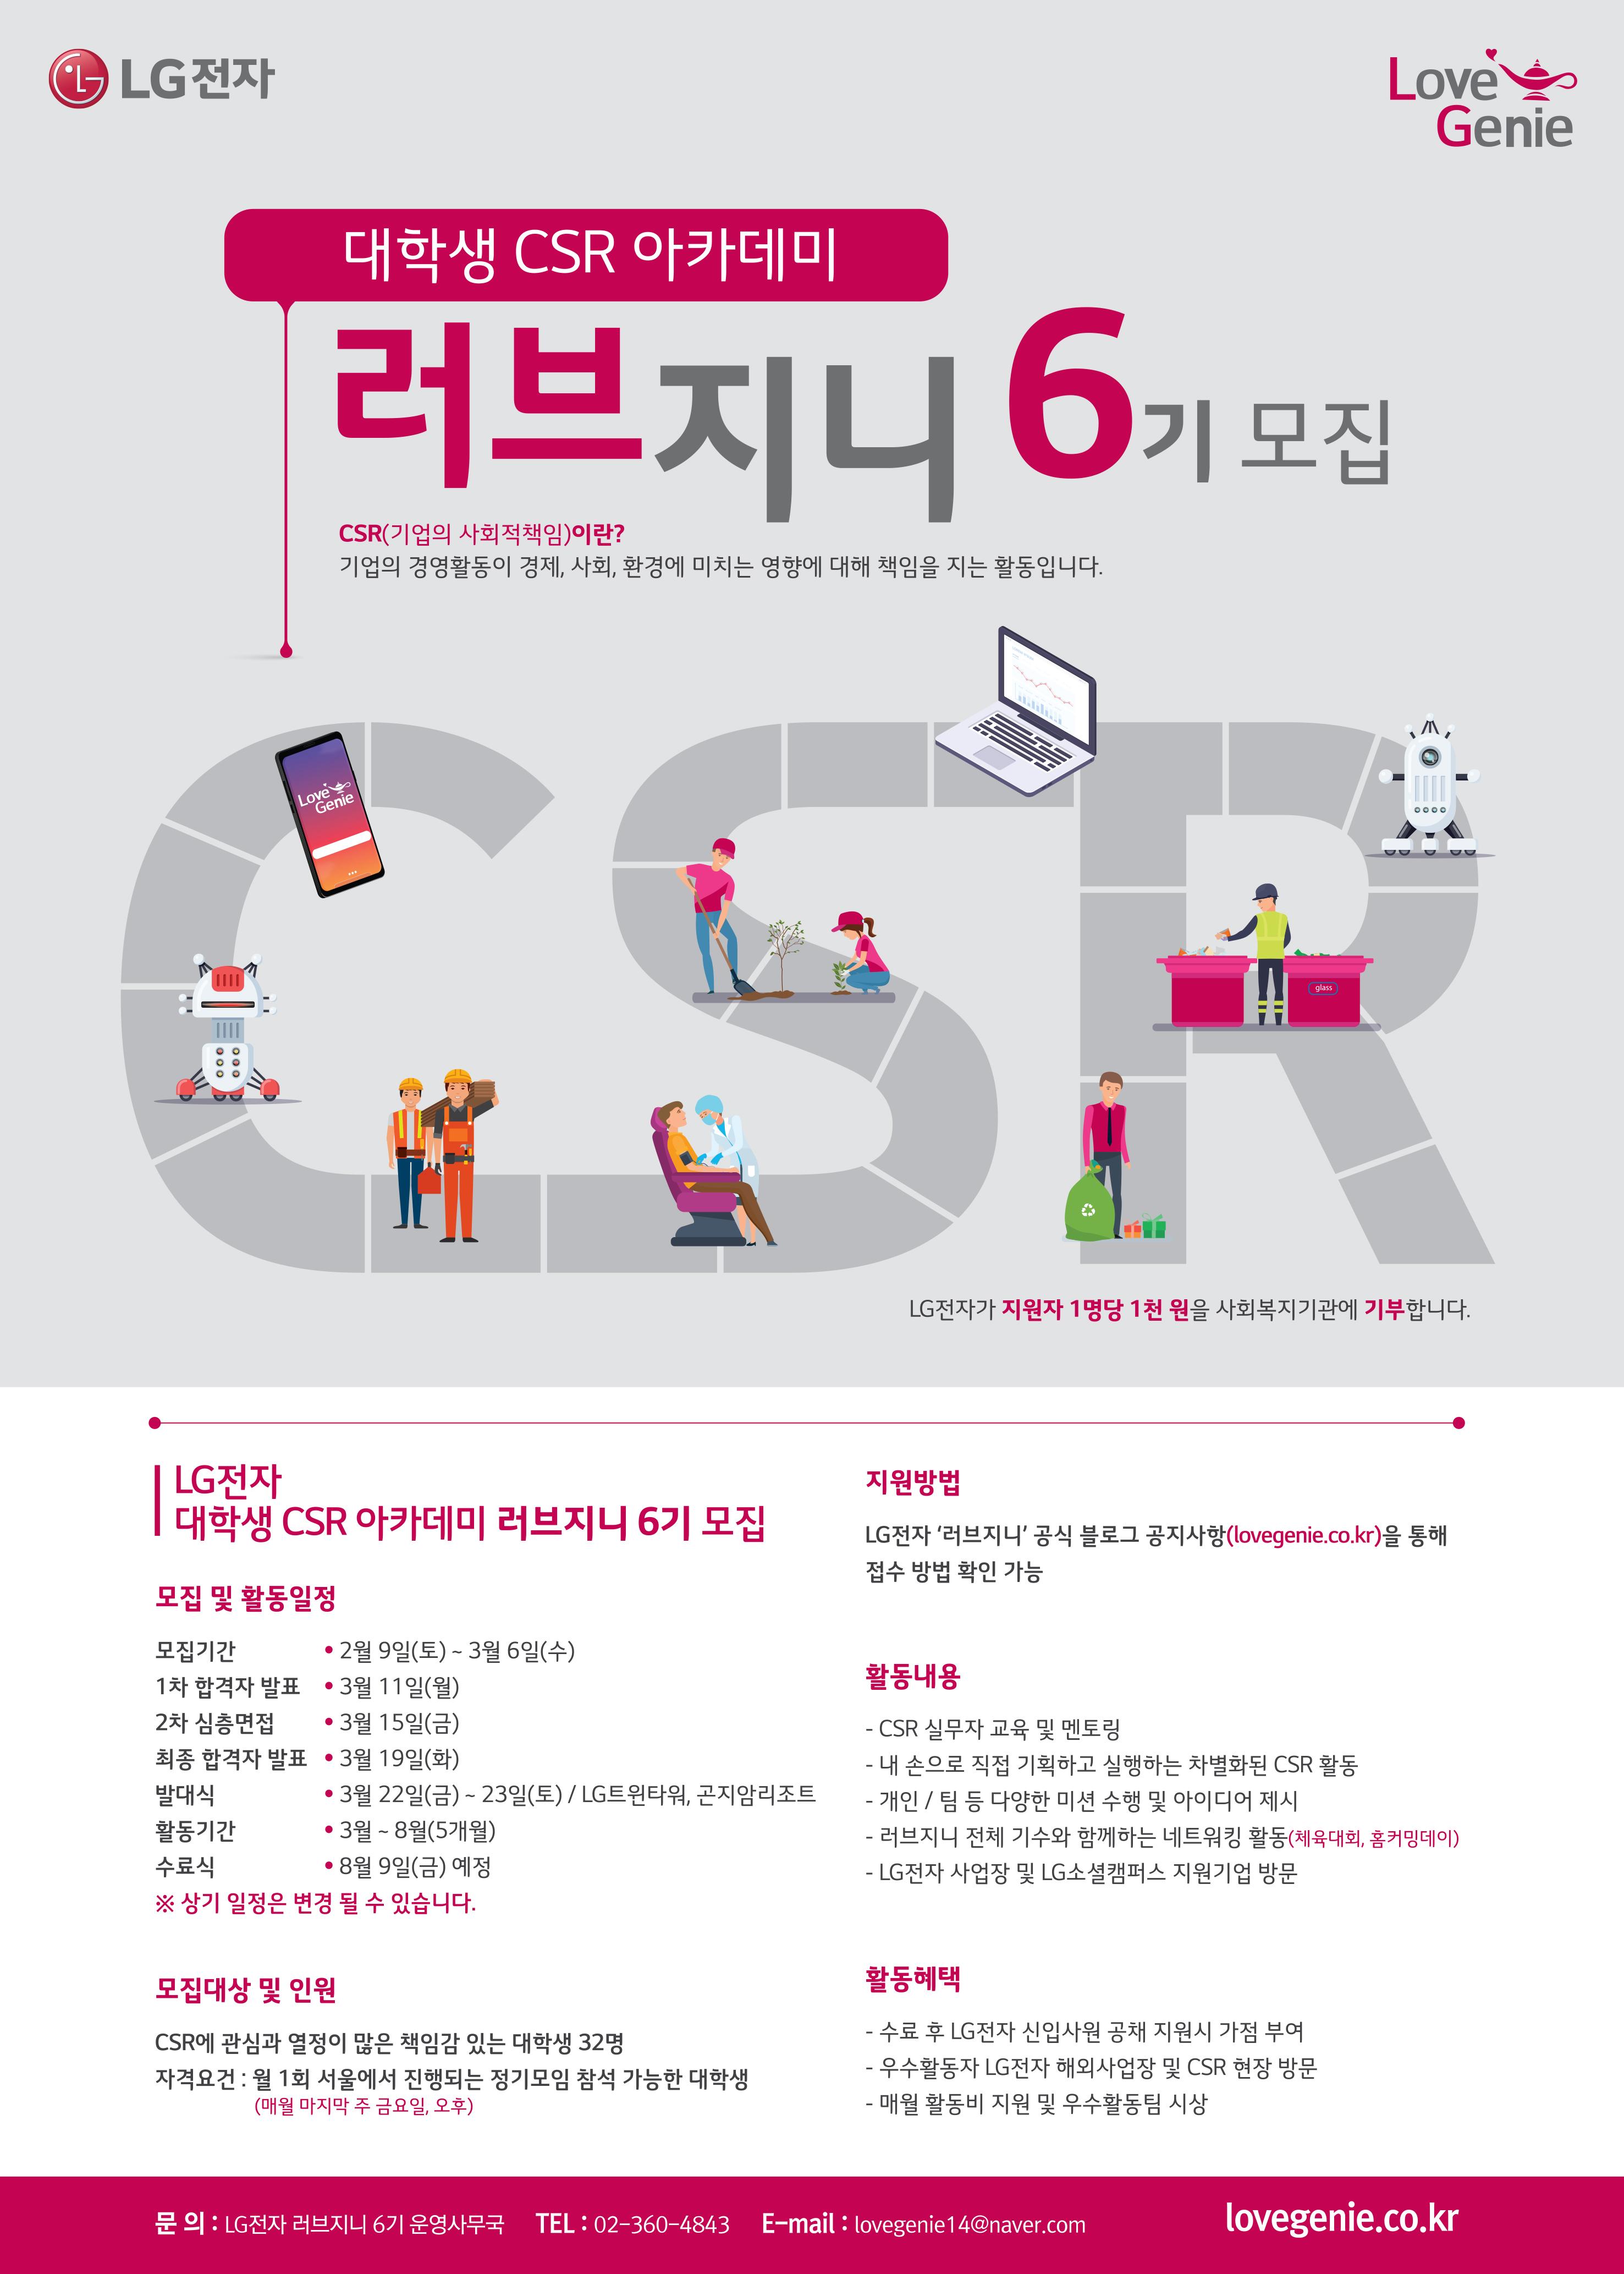 LG전자 대학생 CSR 아카데미 '러브지니' 6기 모집